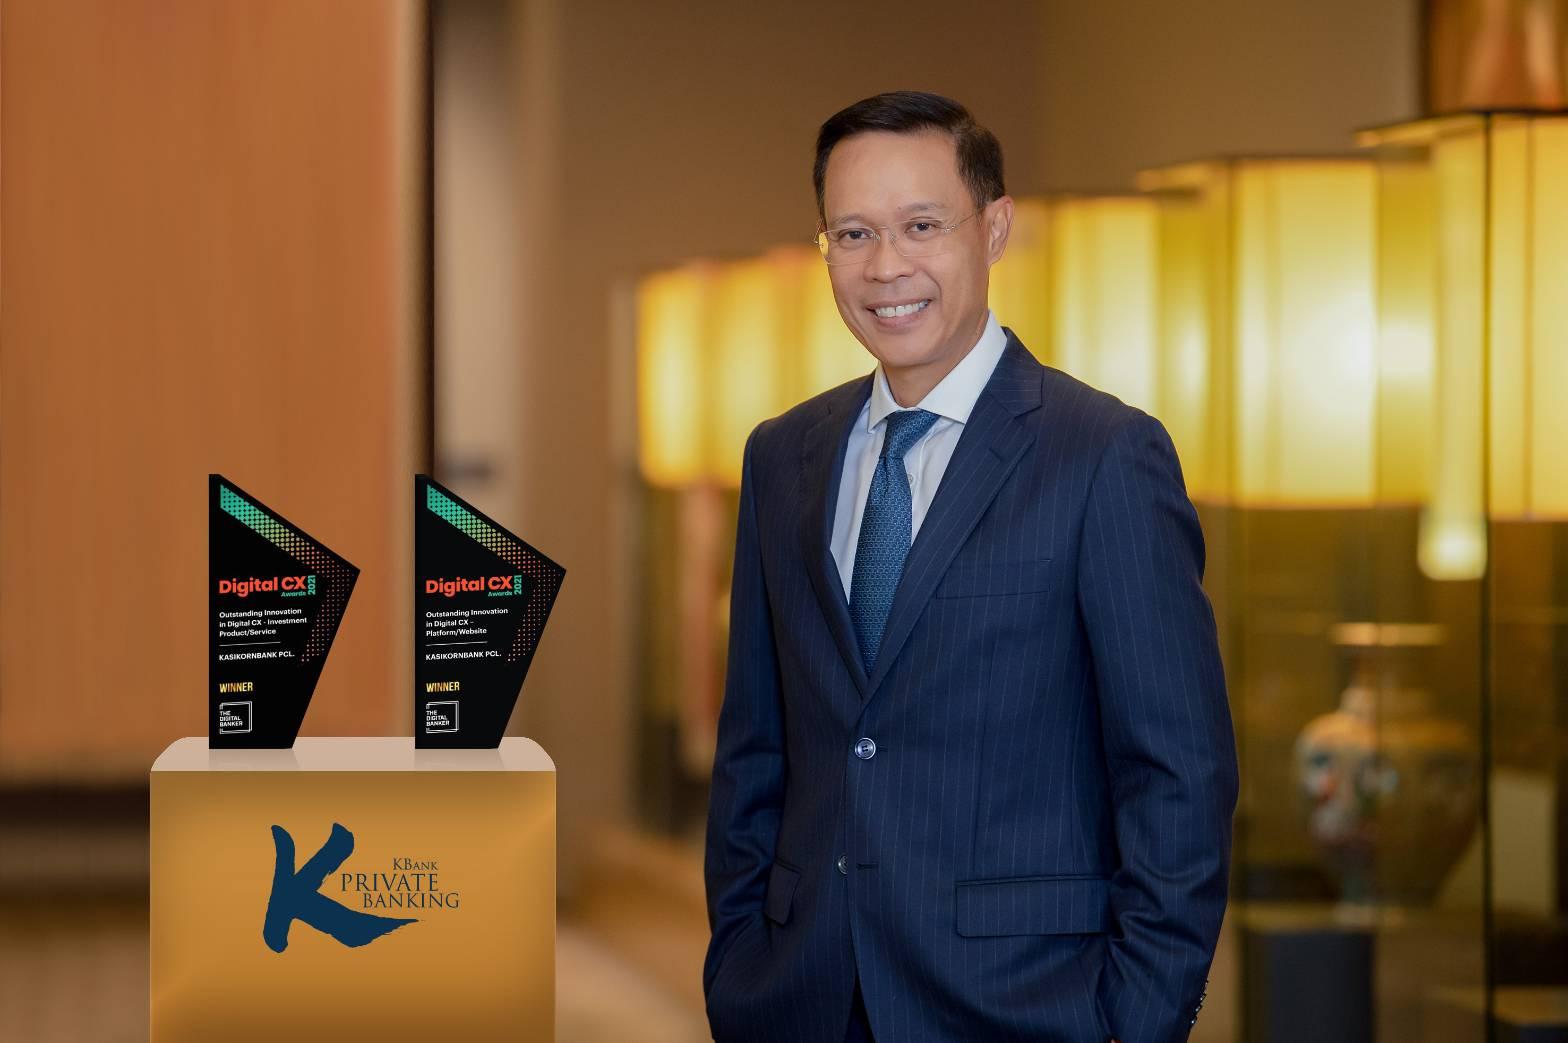 KBank Private Banking คว้า 2 รางวัลนวัตกรรมดีเด่น จากเวที Digital CX Awards 2021